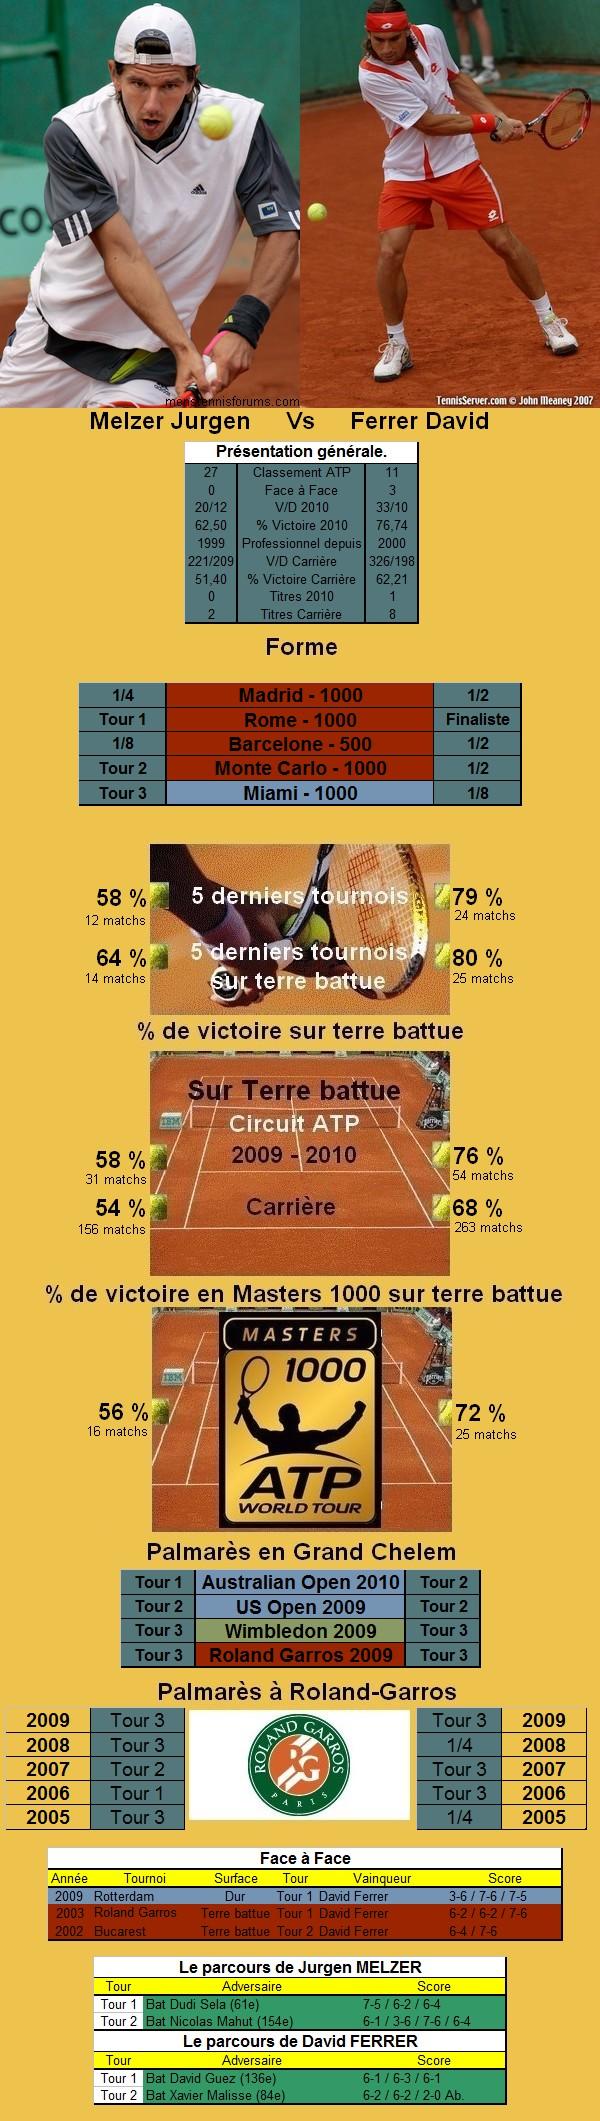 Statistiques tennis de Melzer contre Ferrer à Roland Garros